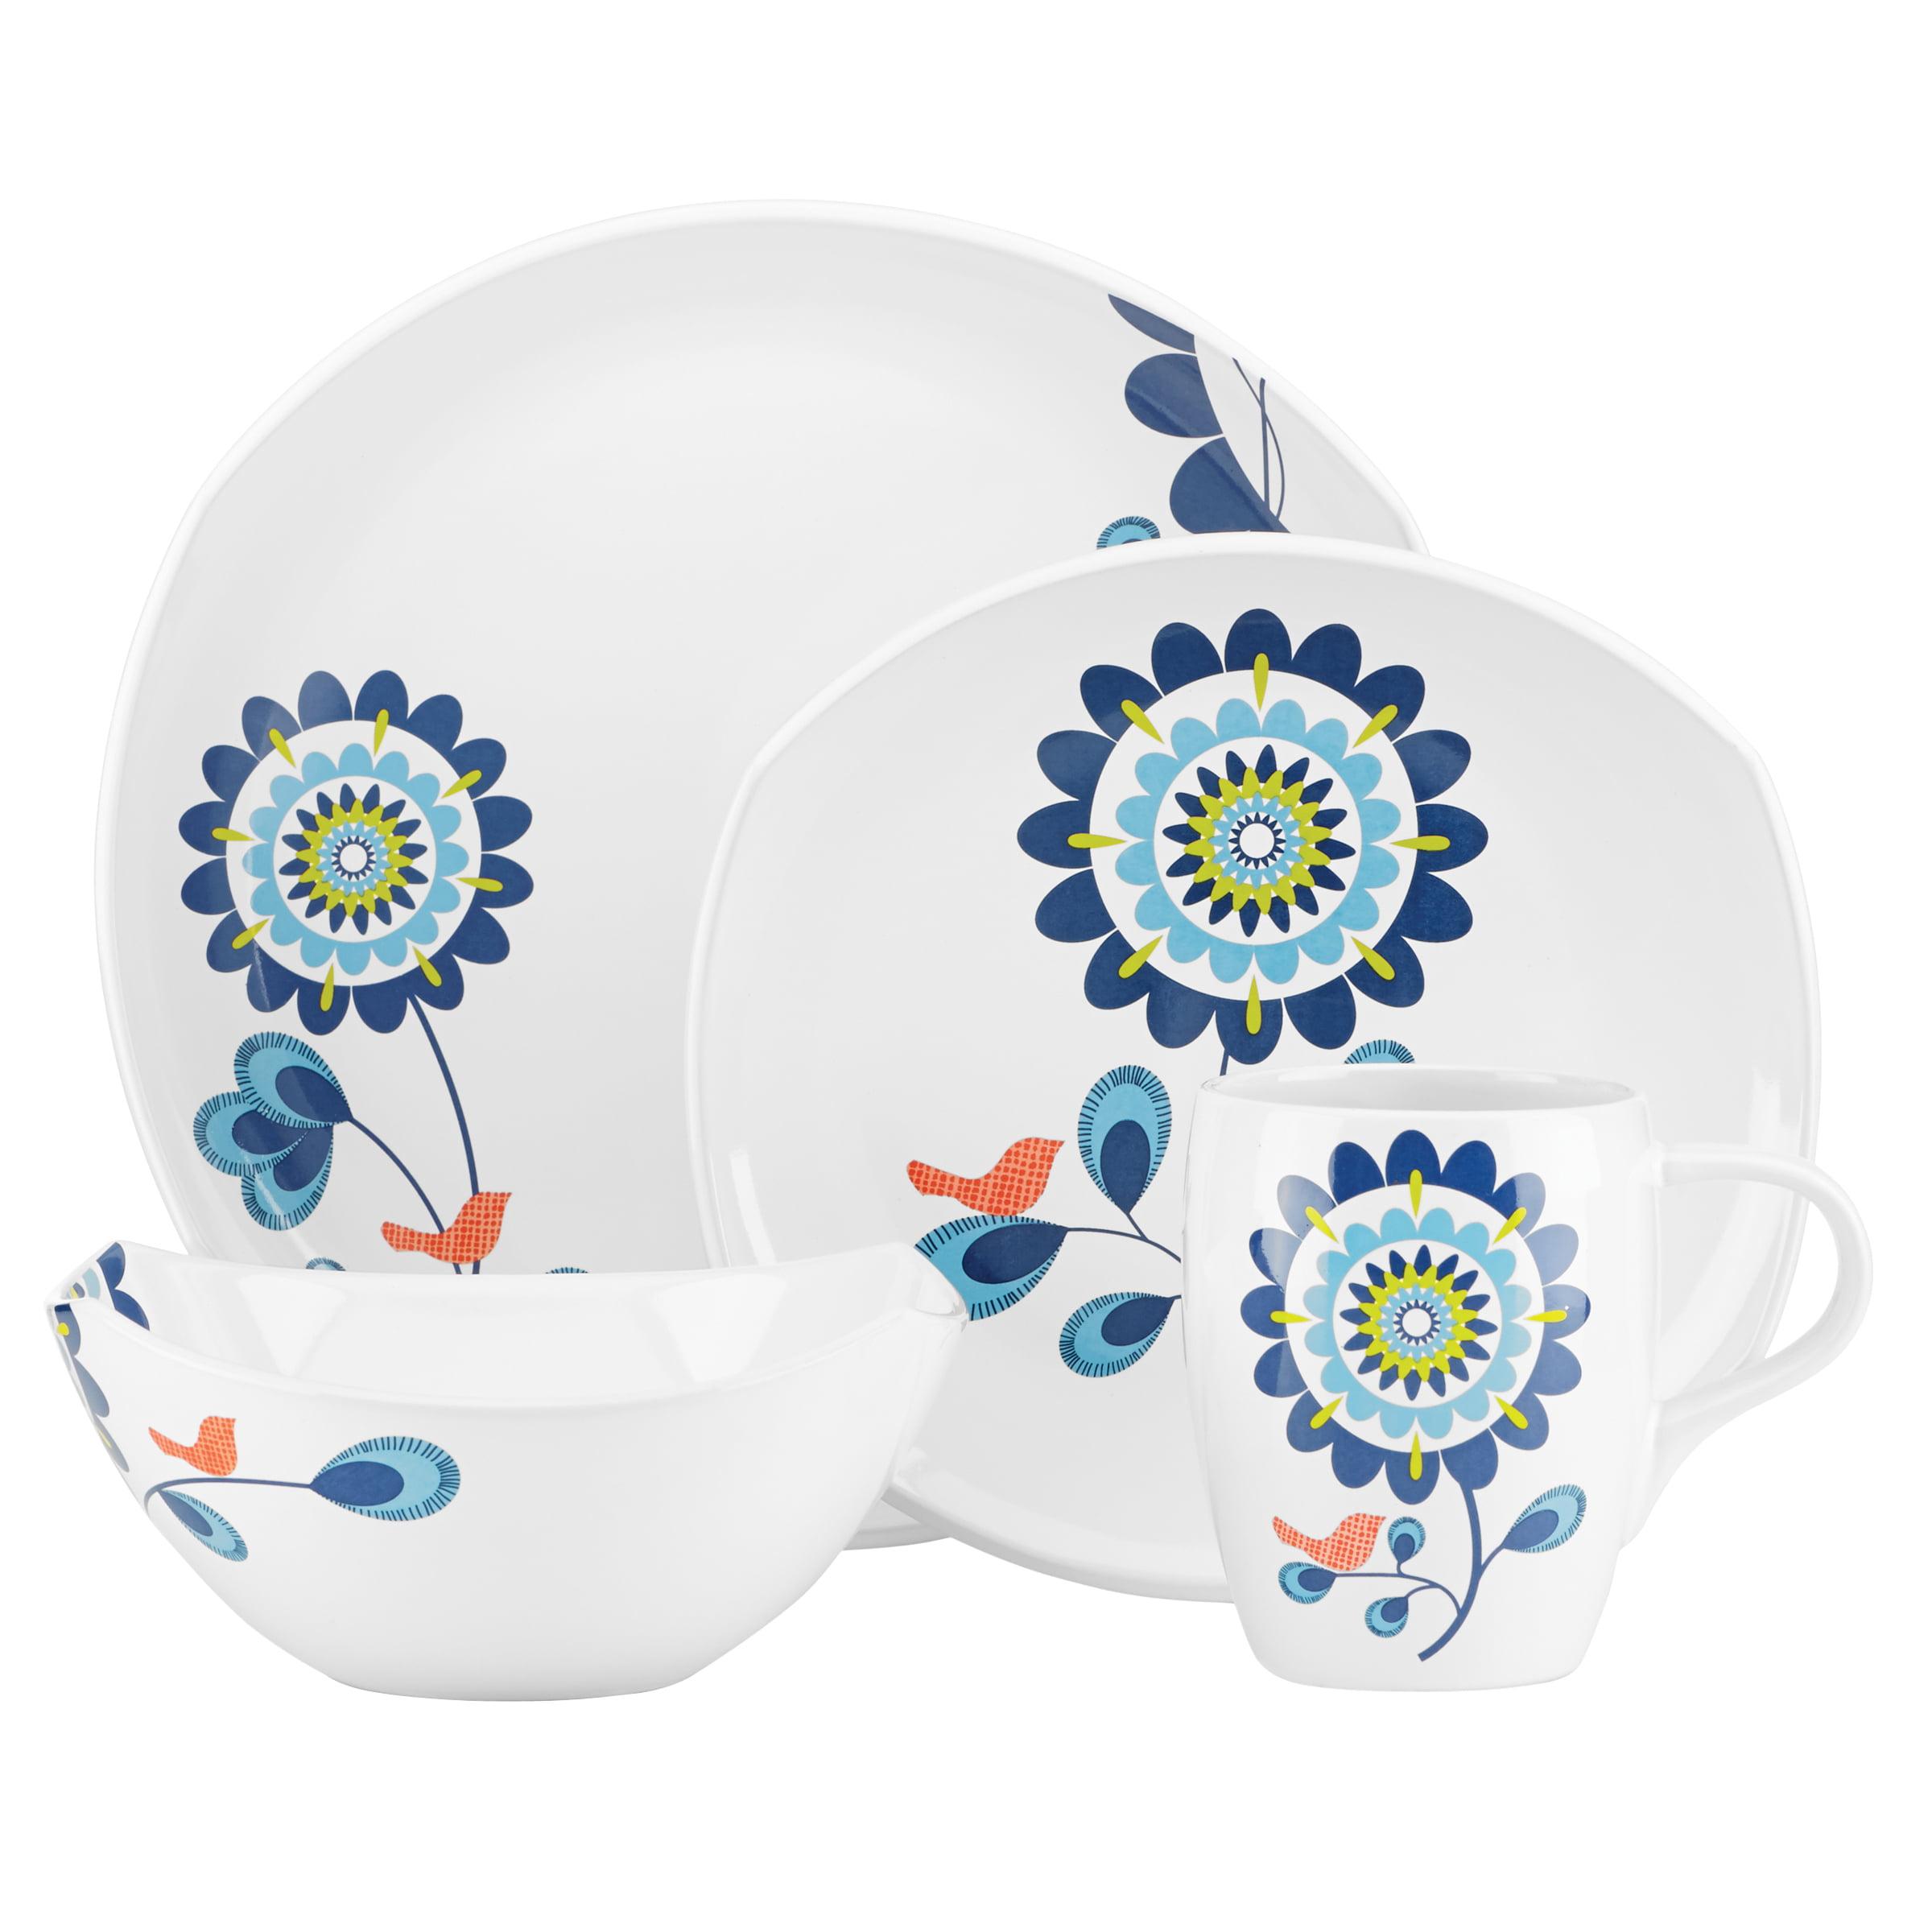 Dansk Dinnerware, Classic Fjord Tweet 4-Piece Place Setting by Lenox